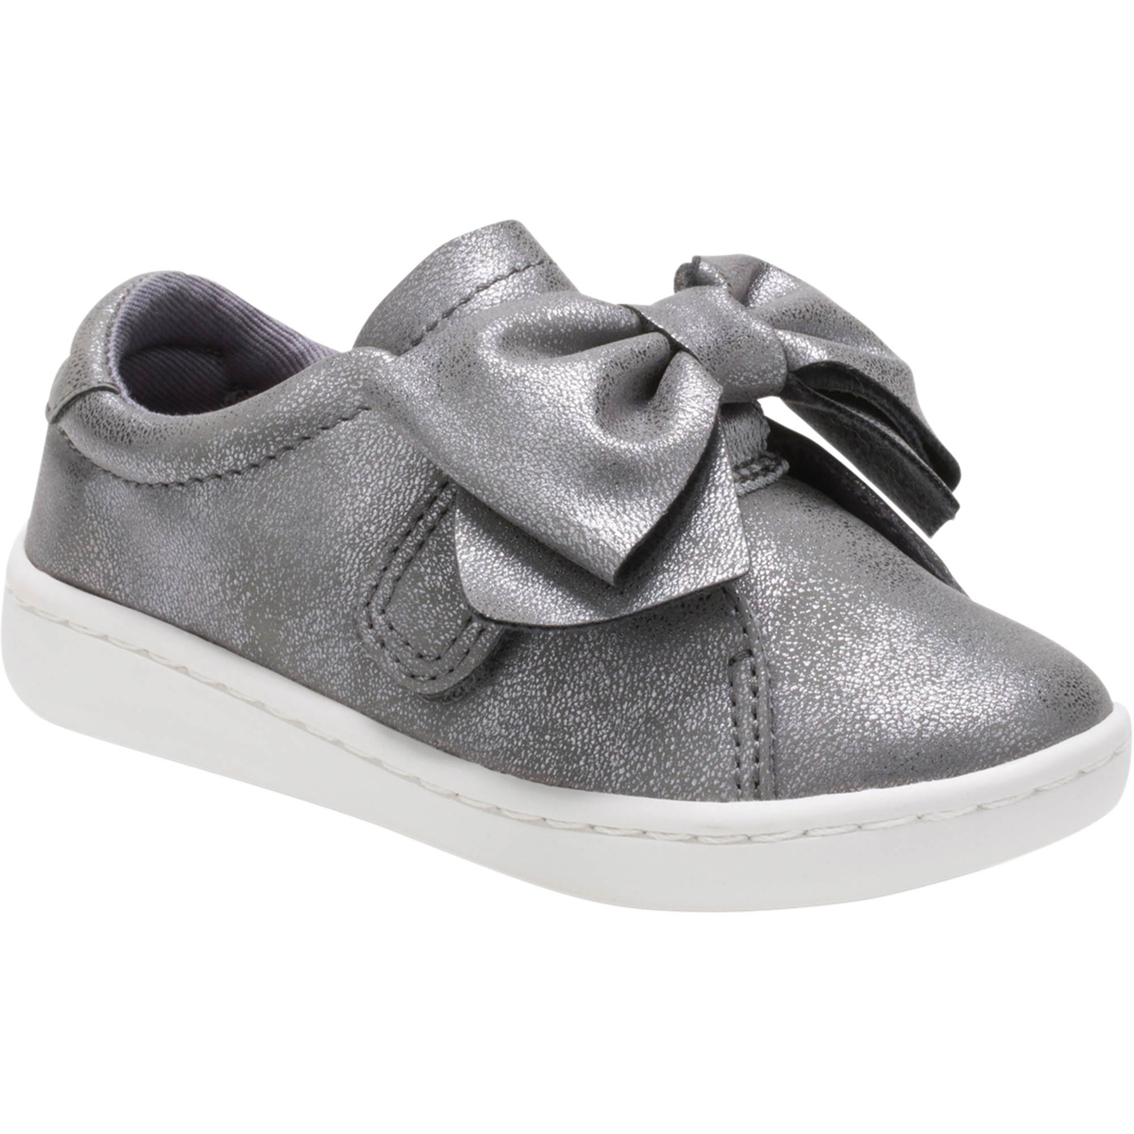 6d3b4e618708f Keds Toddler Girls Ace Bow Jr. Sneakers